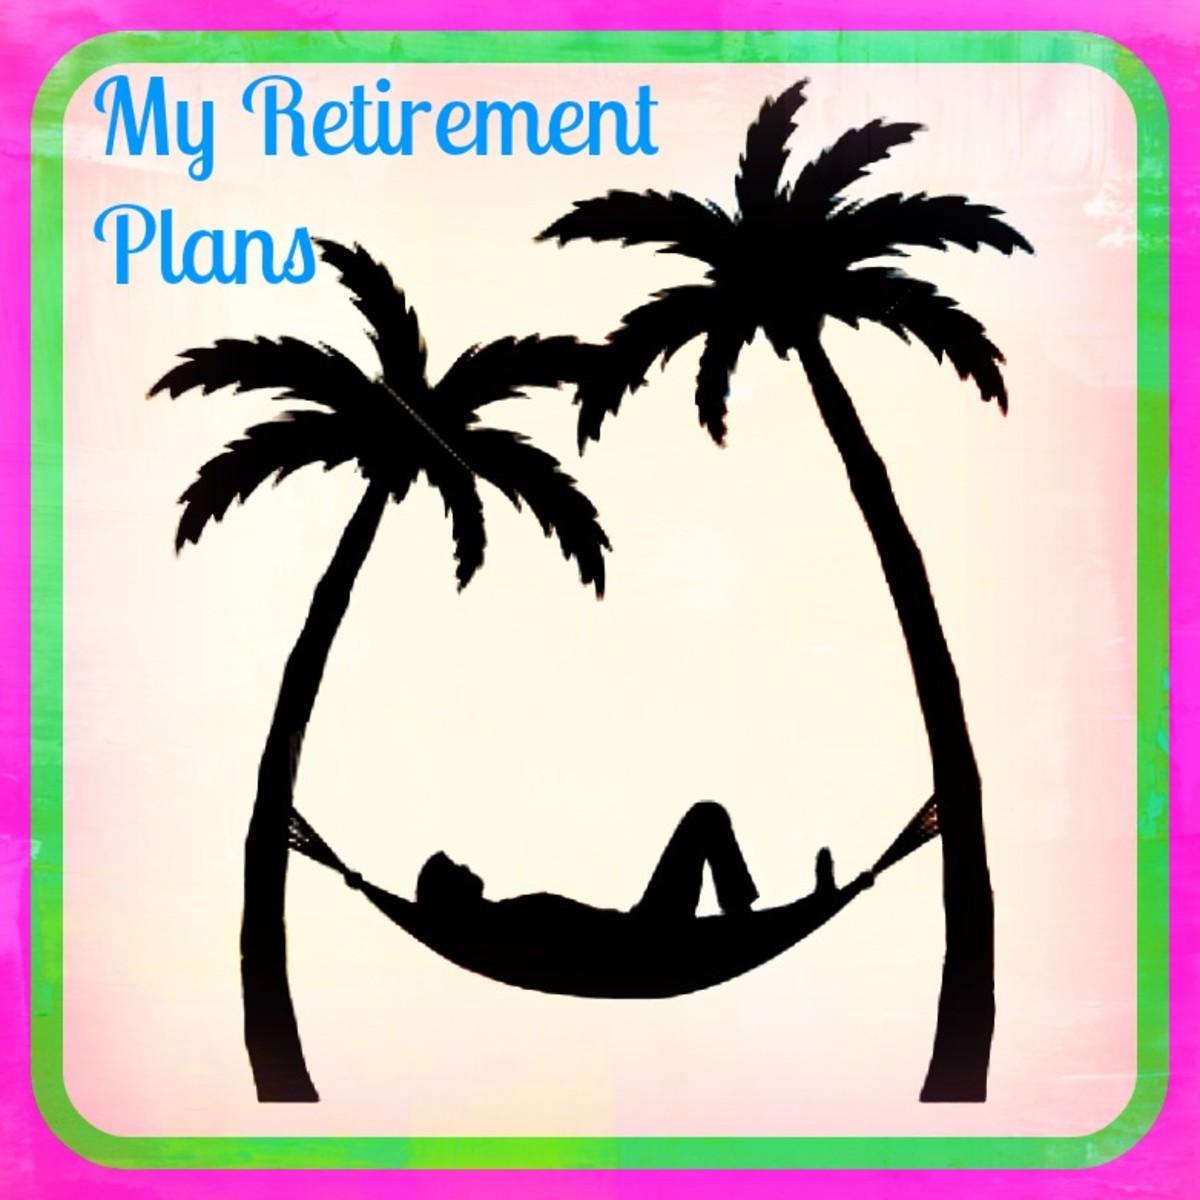 My Retirement Plans